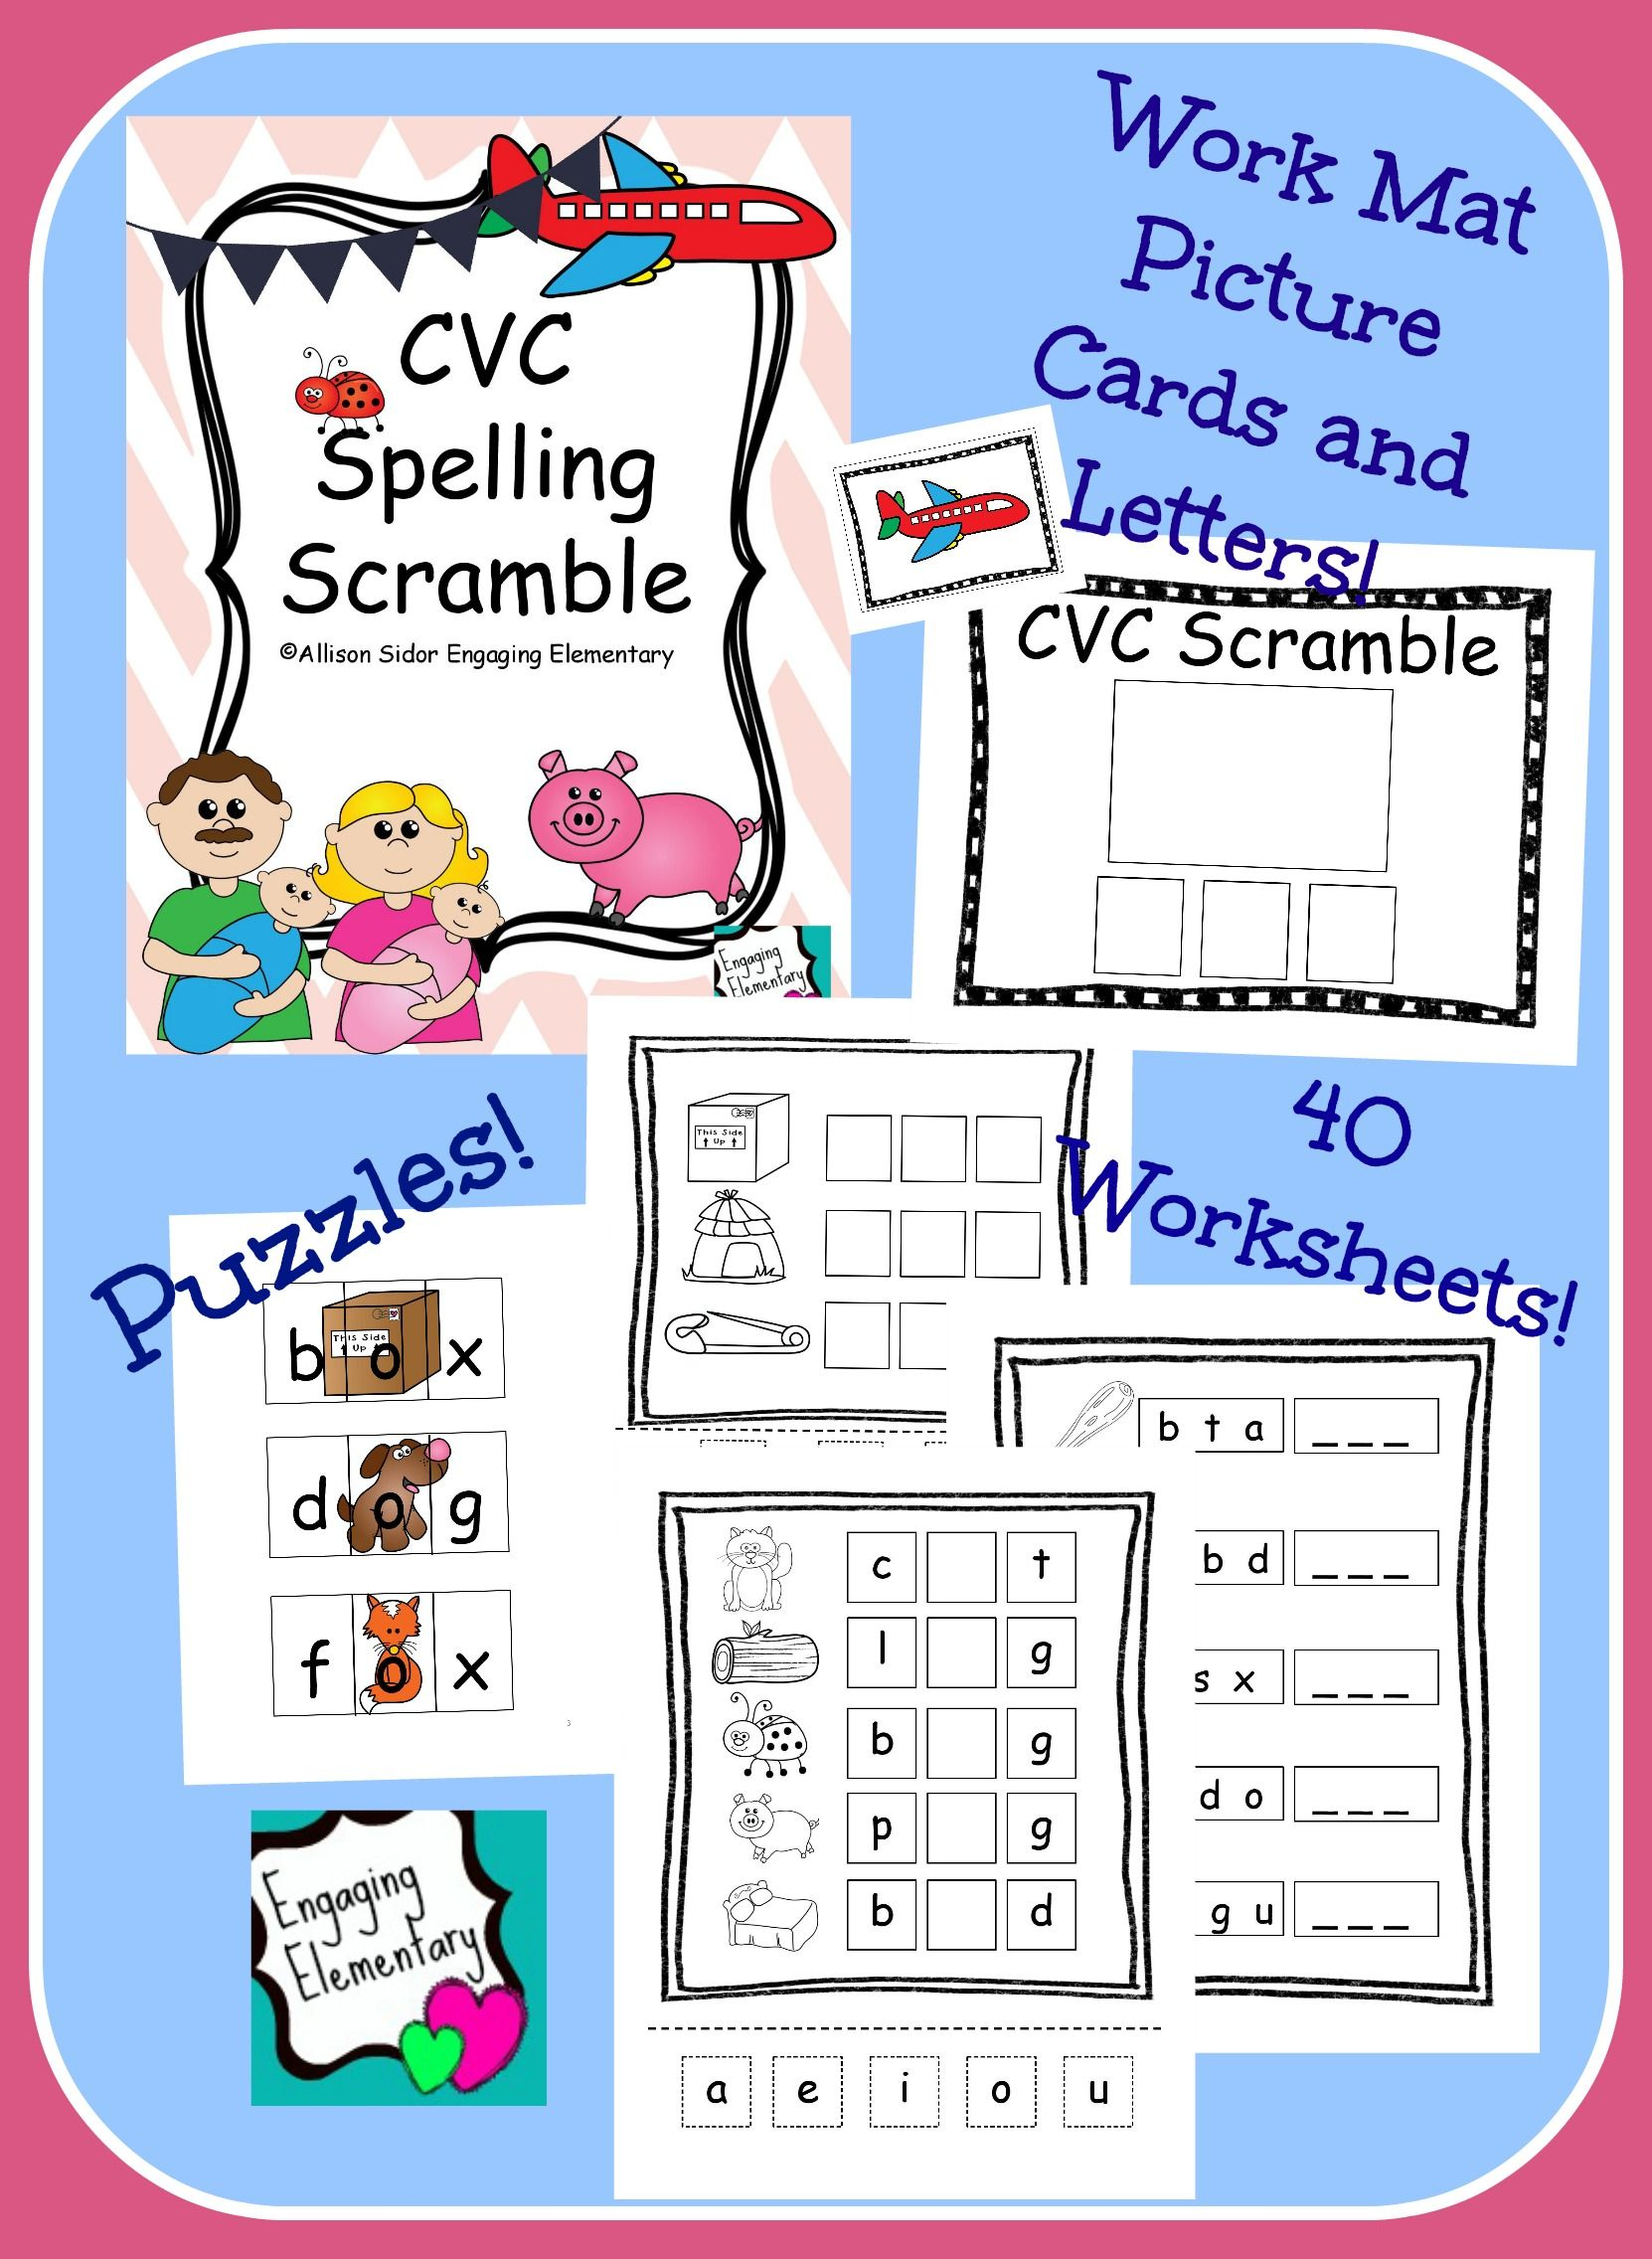 - CVC Spelling Scramble Math For Kids, Kindergarten Reading, Spelling